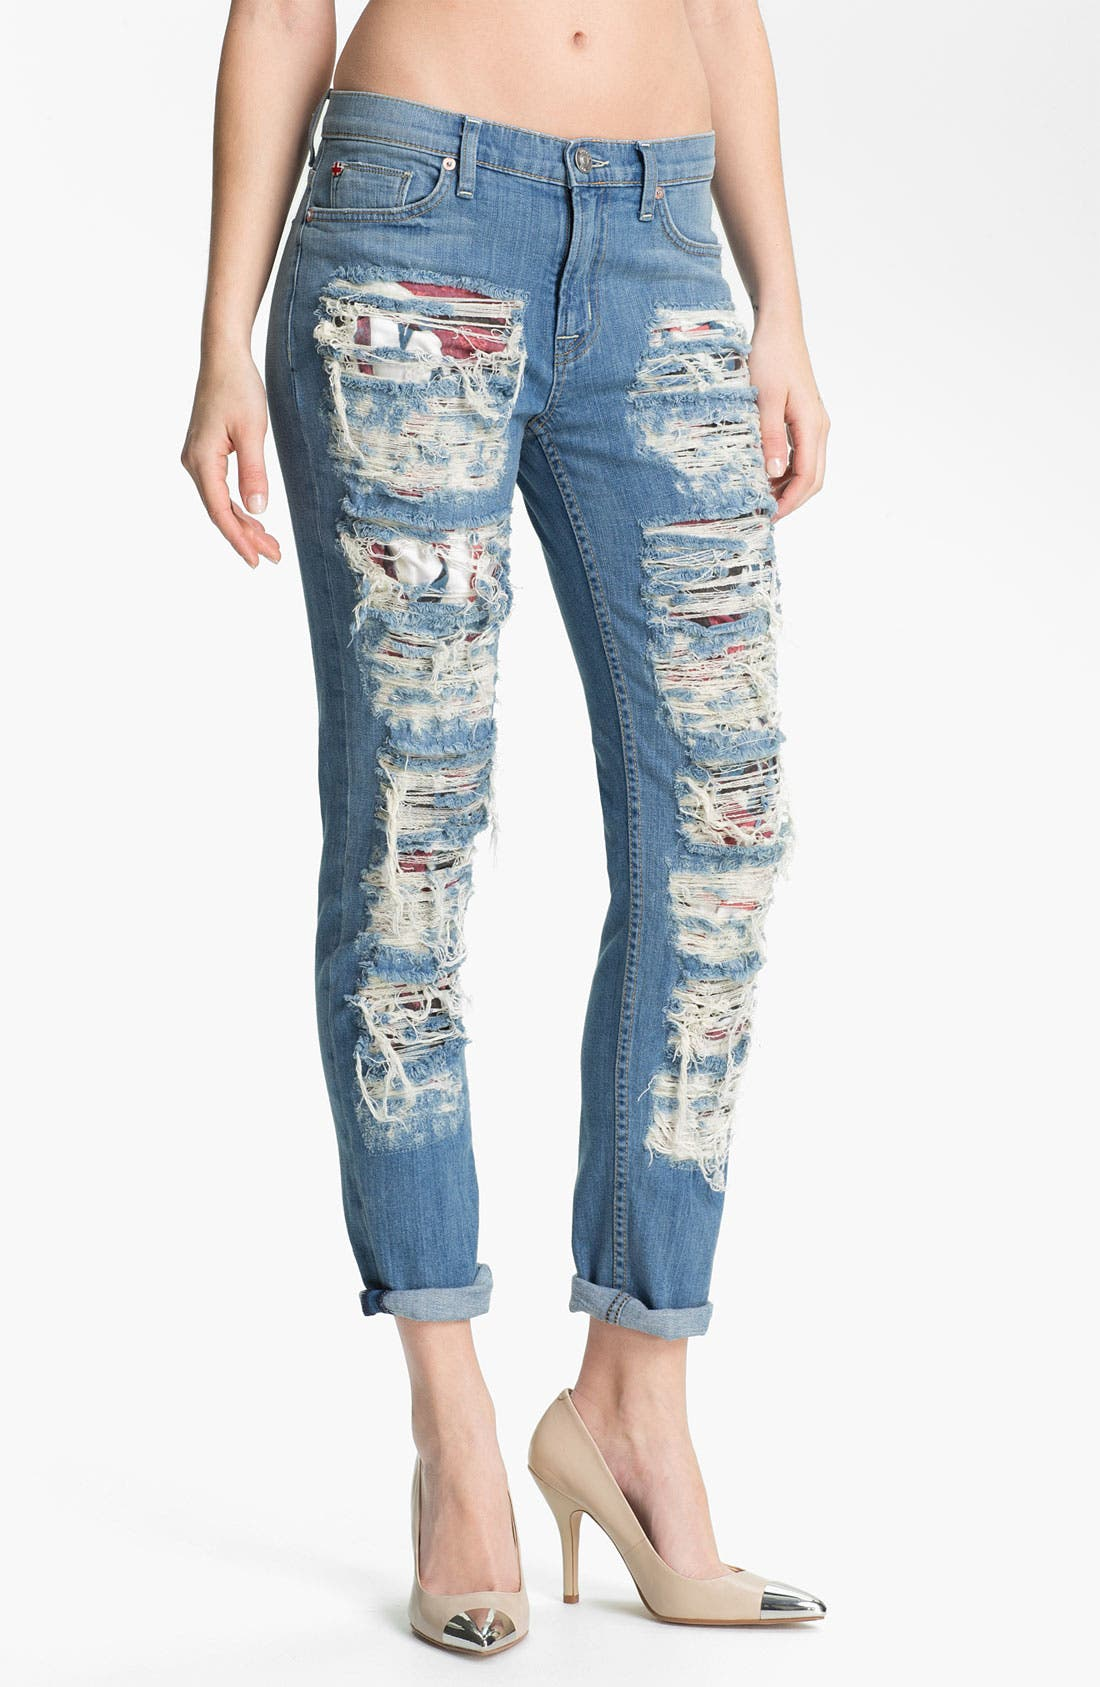 Alternate Image 1 Selected - Hudson Jeans 'Courtney' Slashed Straight Leg Jeans (Anti-Establishment)